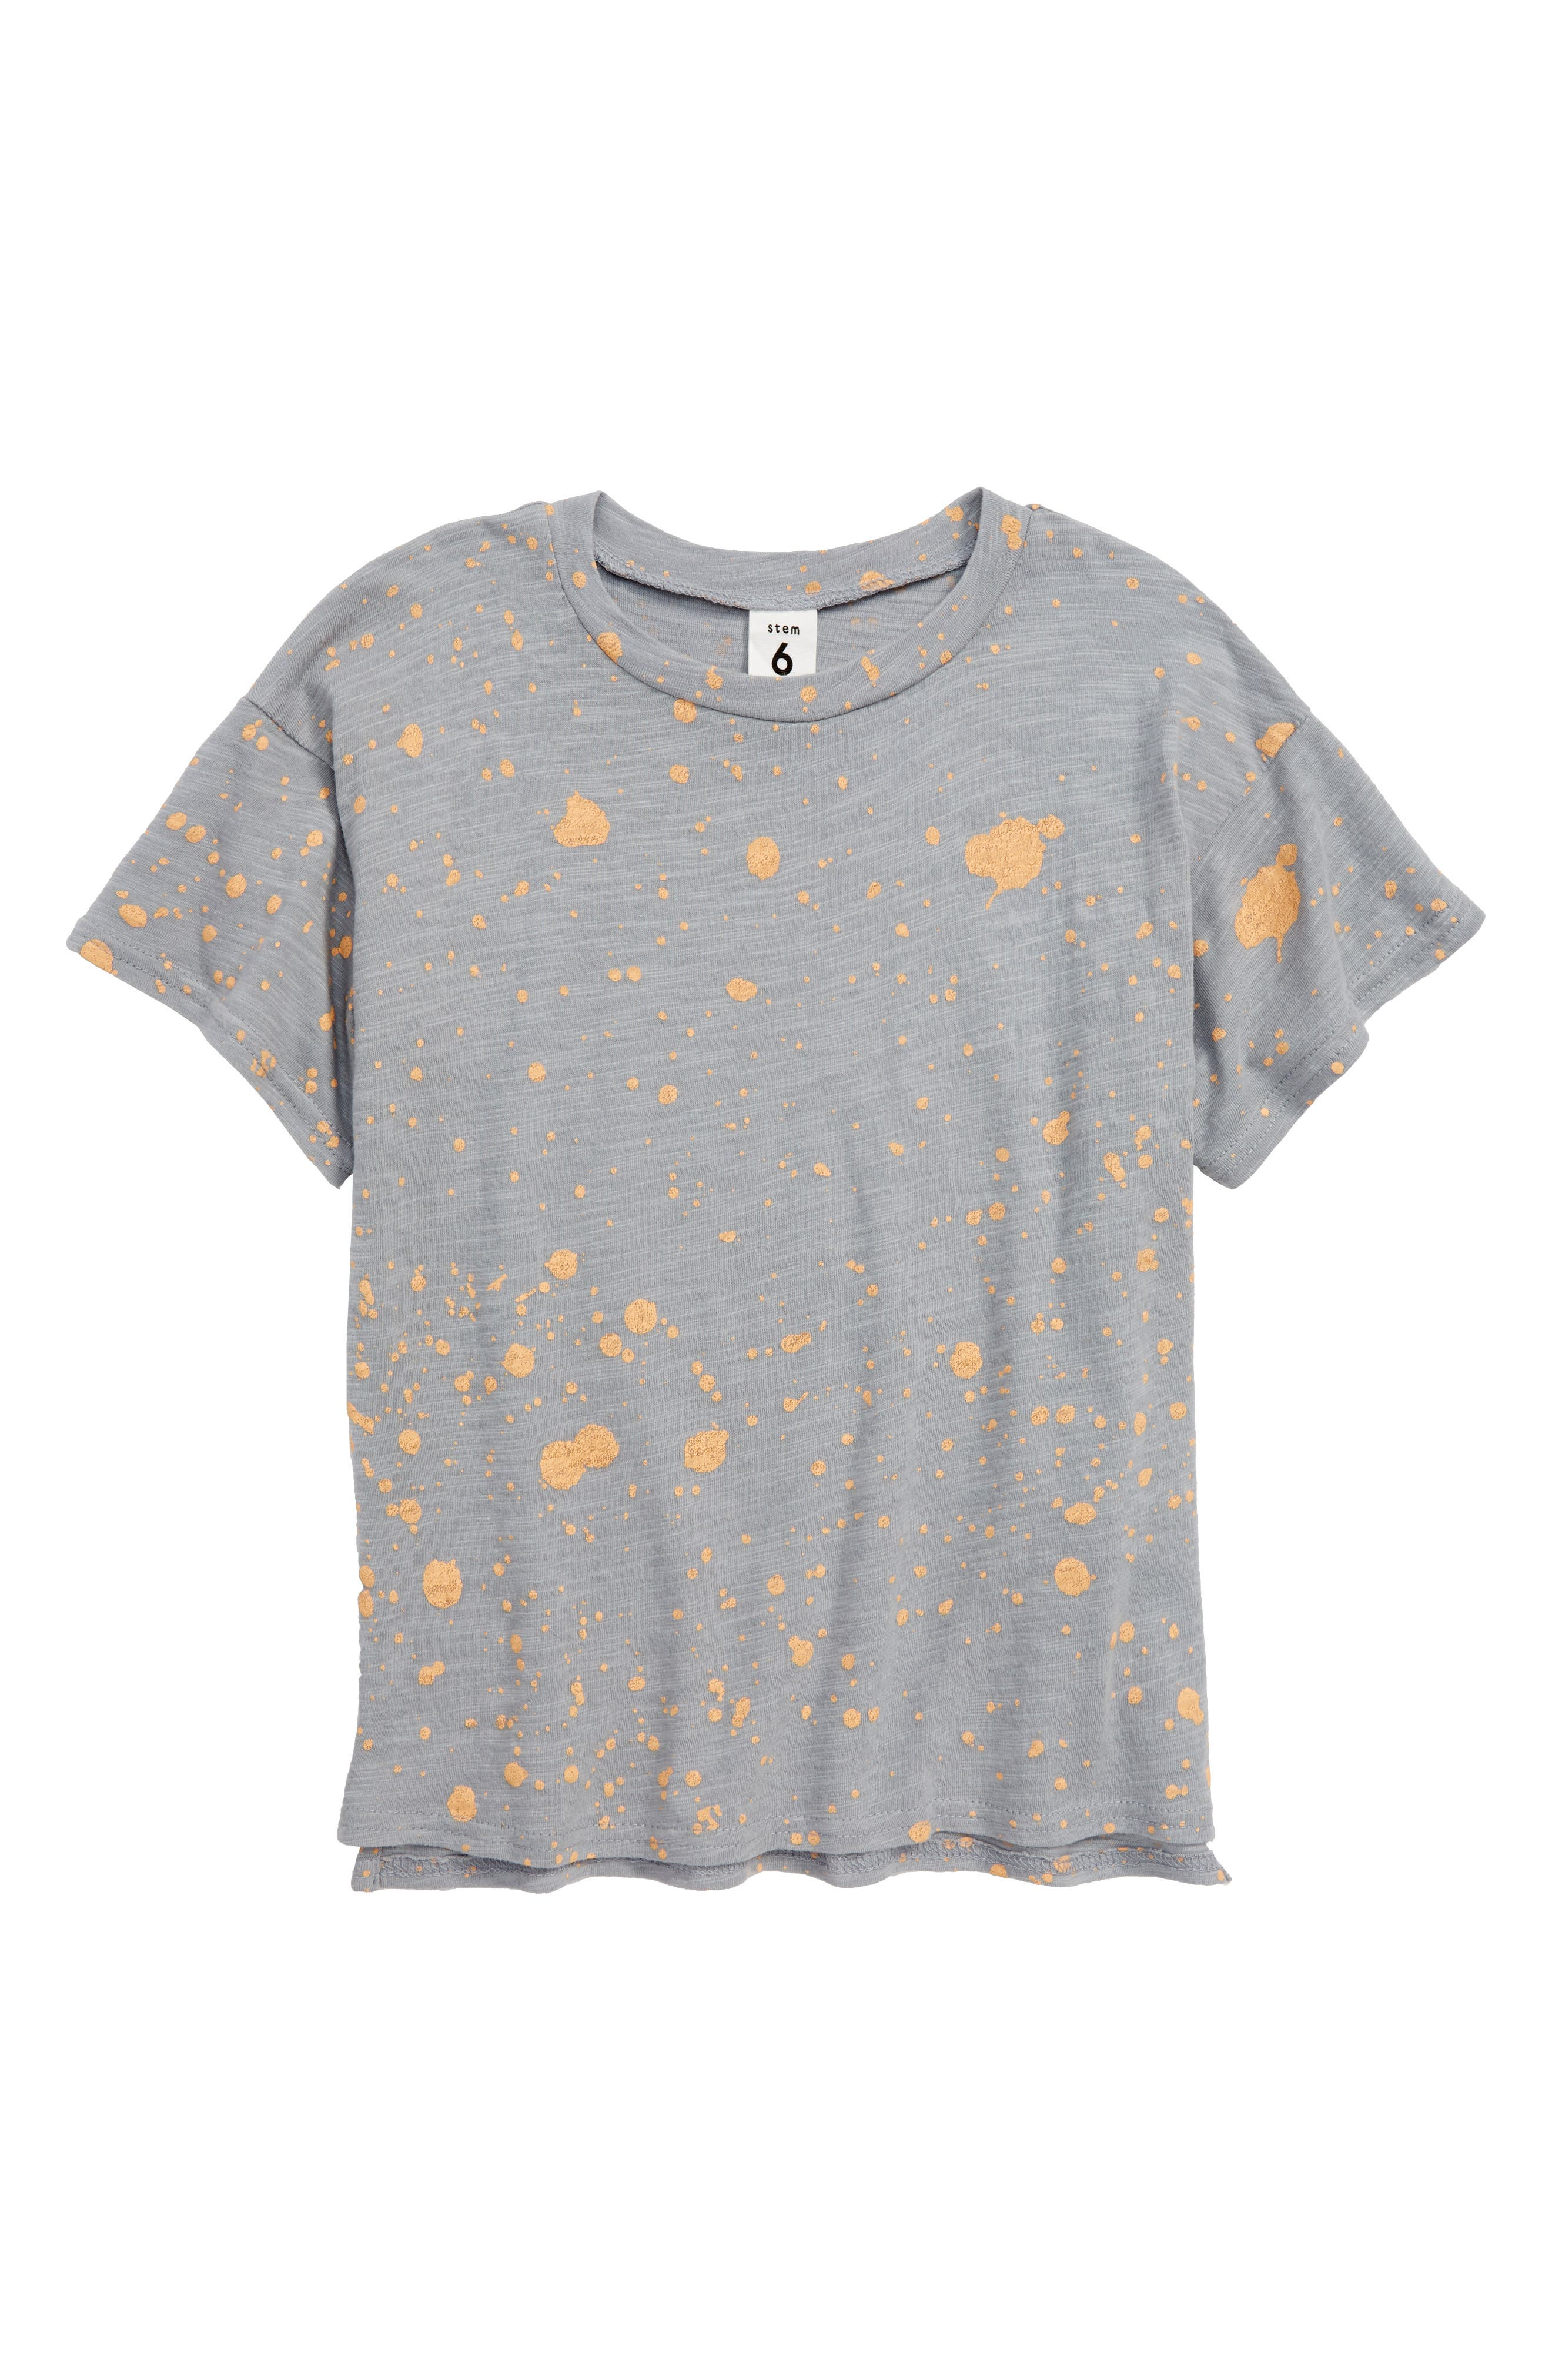 Print T-Shirt,                         Main,                         color, Grey Sleet- Orange Splatter